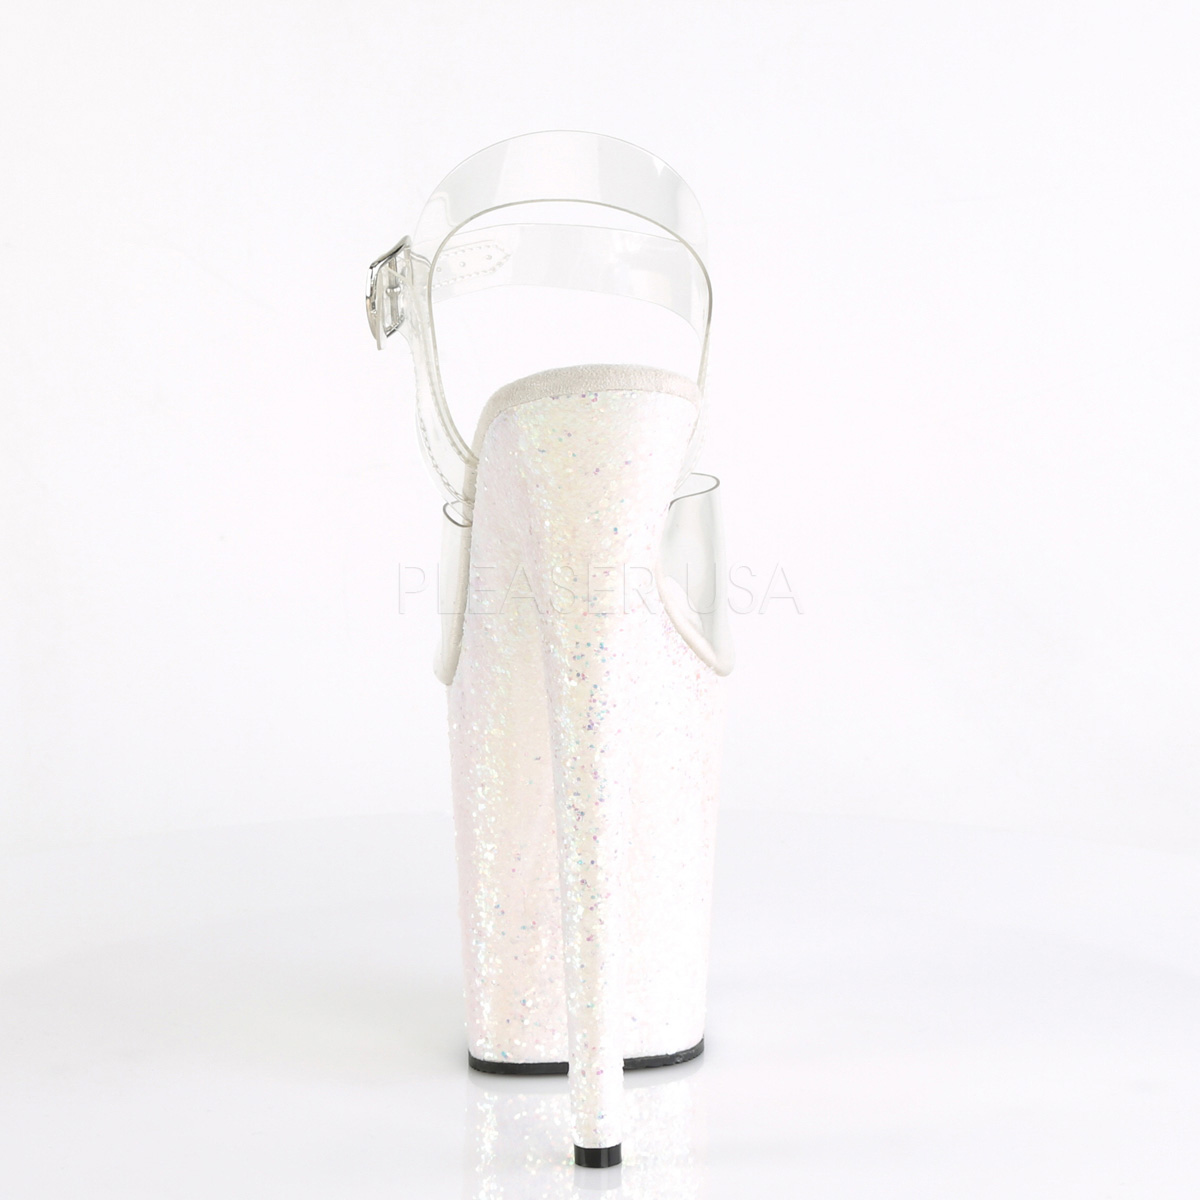 20 808lg Platform Sandal Heeled Opal High Flamingo Glitter Cm Shoes 9WE2IDYH